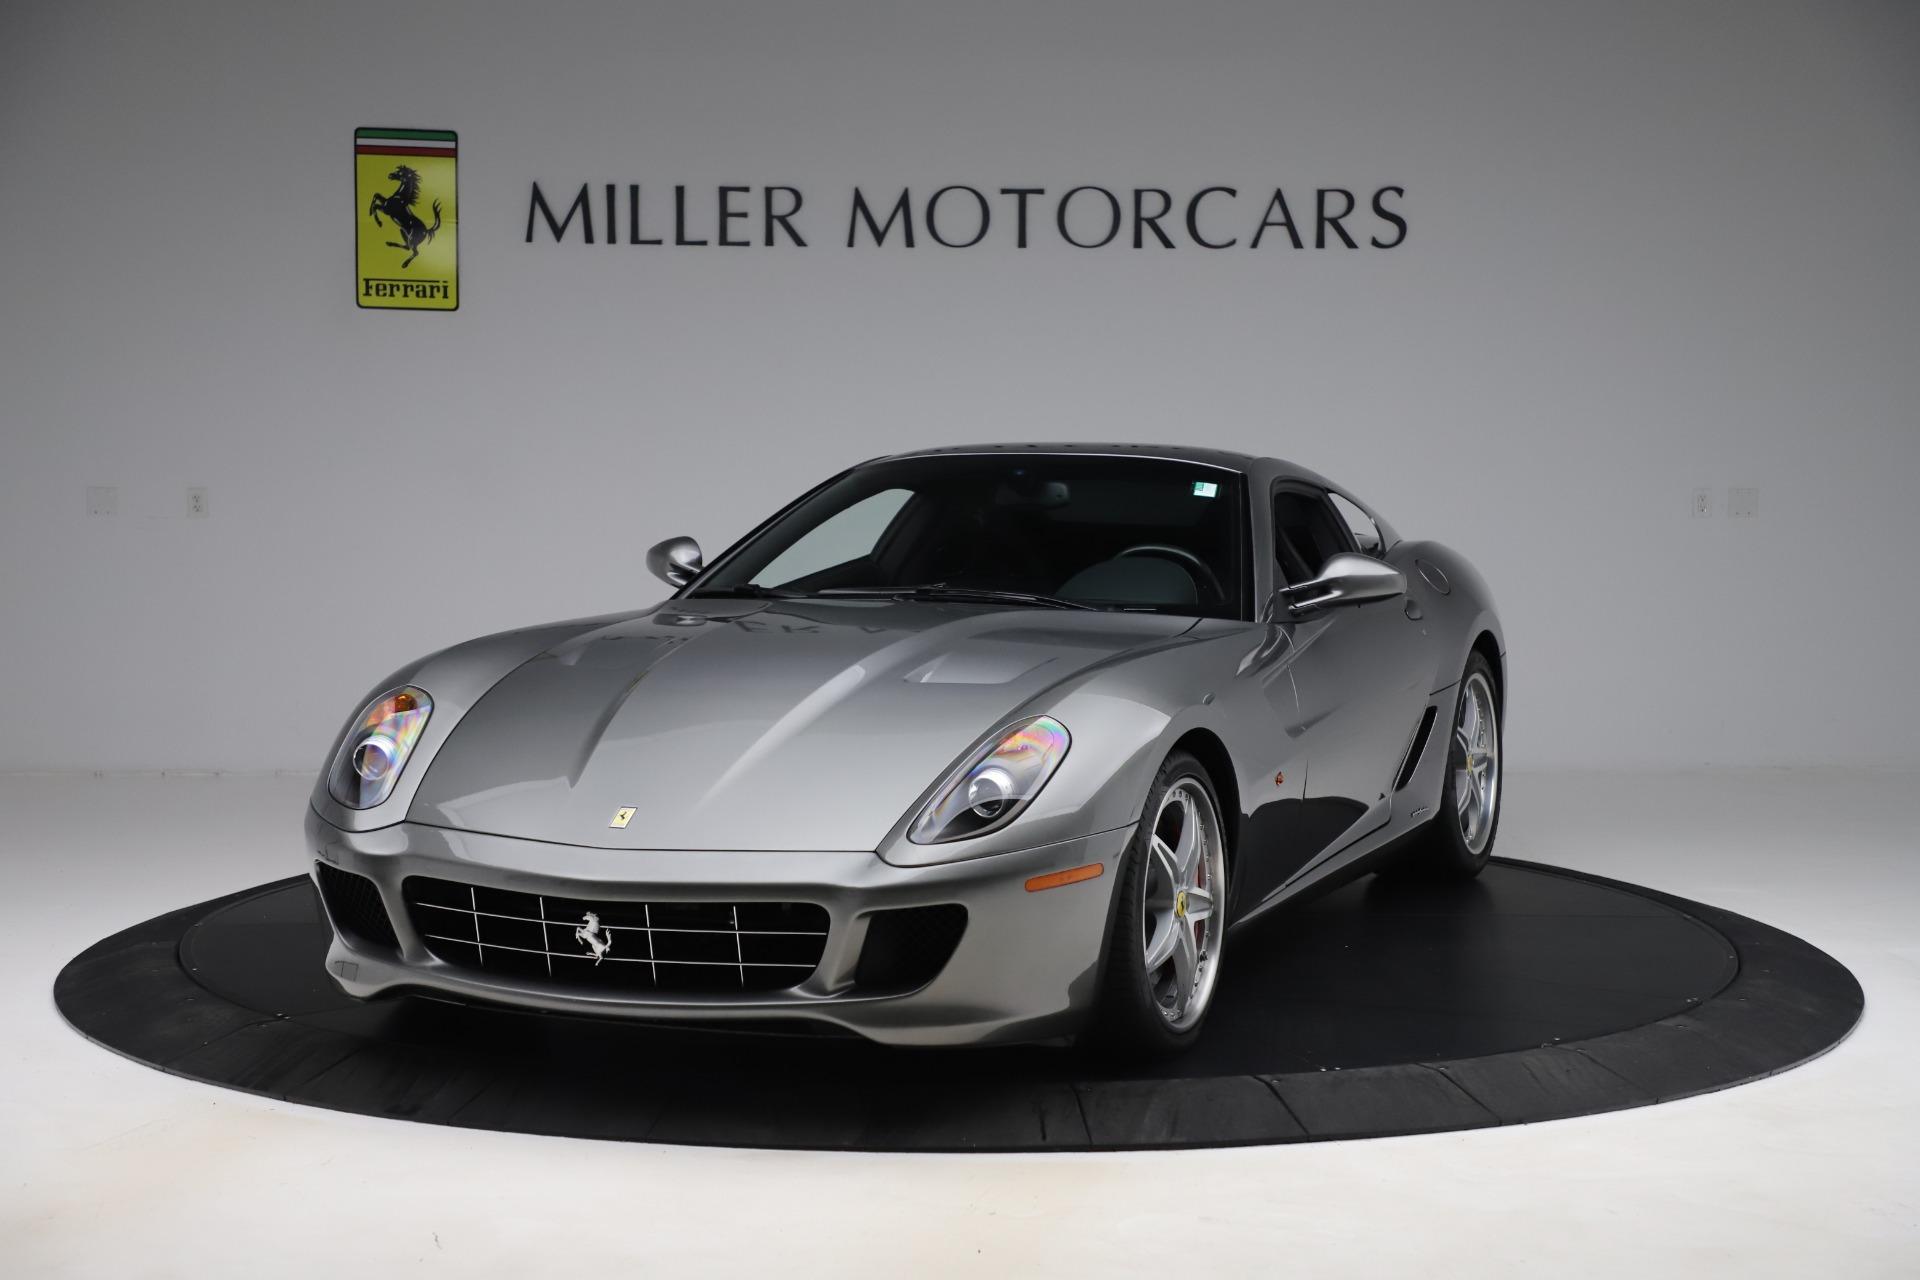 Used 2010 Ferrari 599 GTB Fiorano HGTE for sale Sold at Maserati of Westport in Westport CT 06880 1